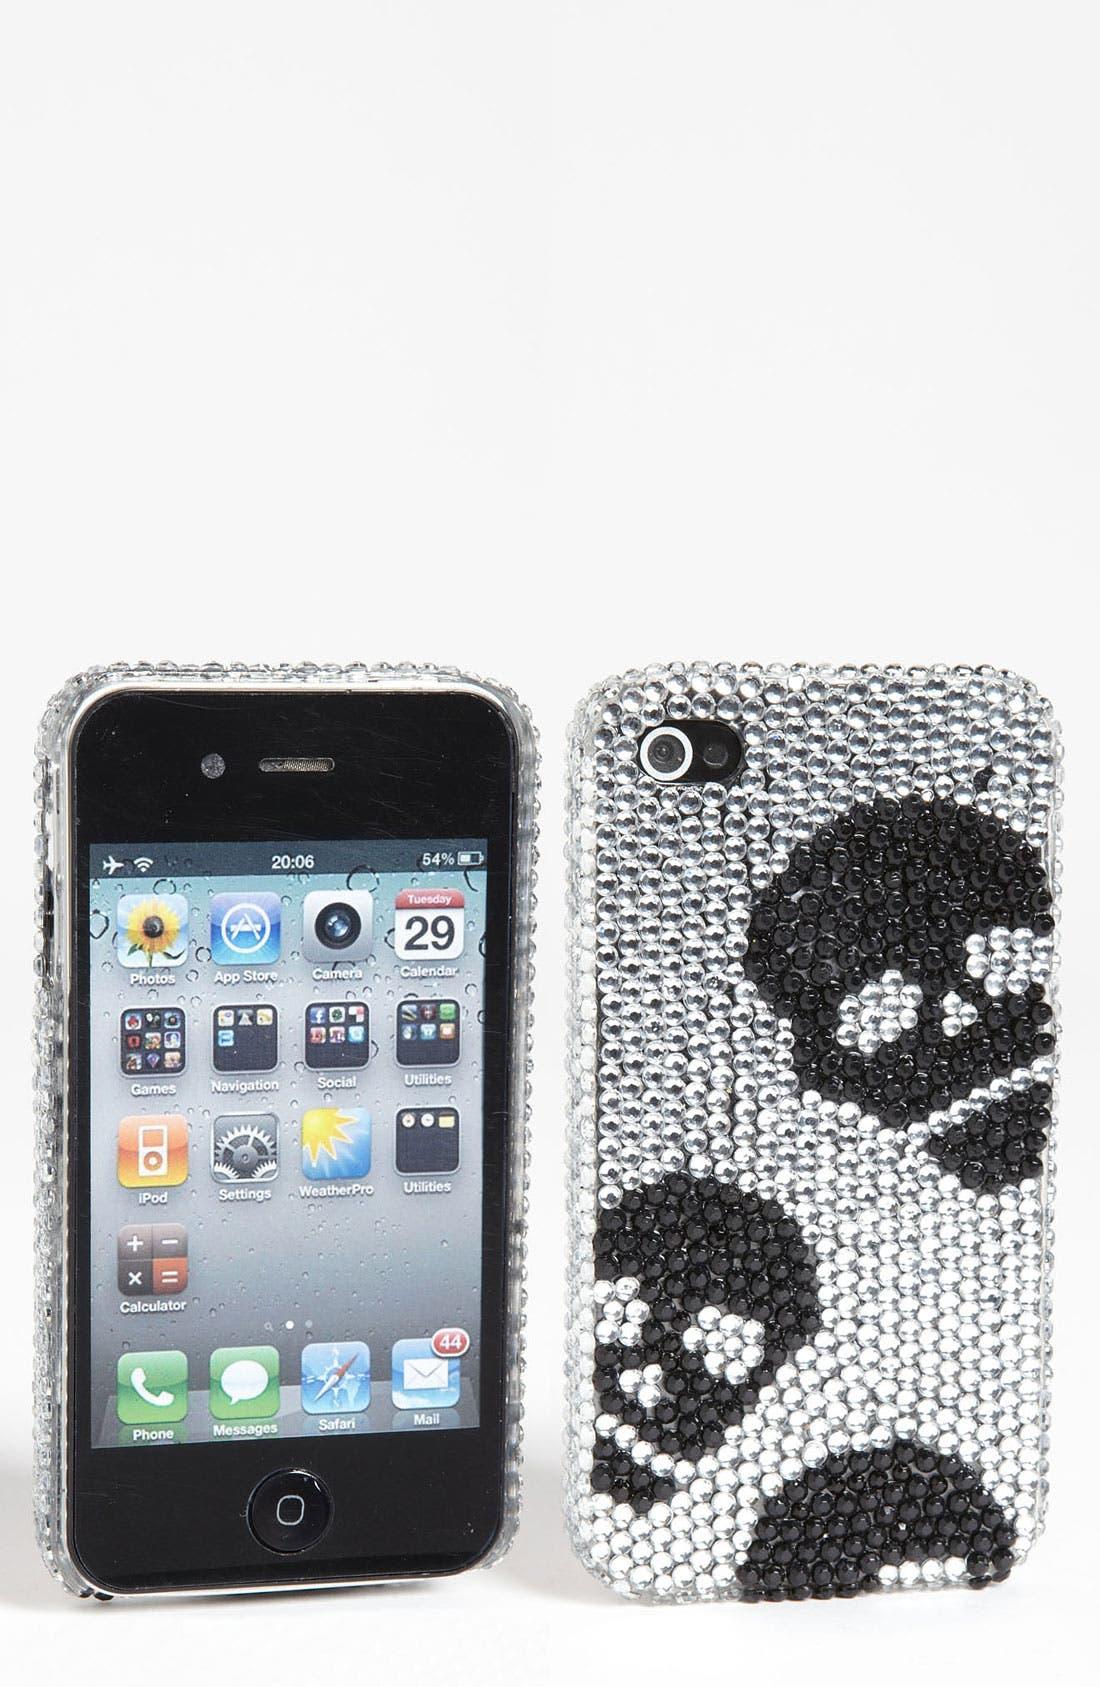 Main Image - Tri-Coastal Design iPhone 4 & 4s Skull Rhinestone Case